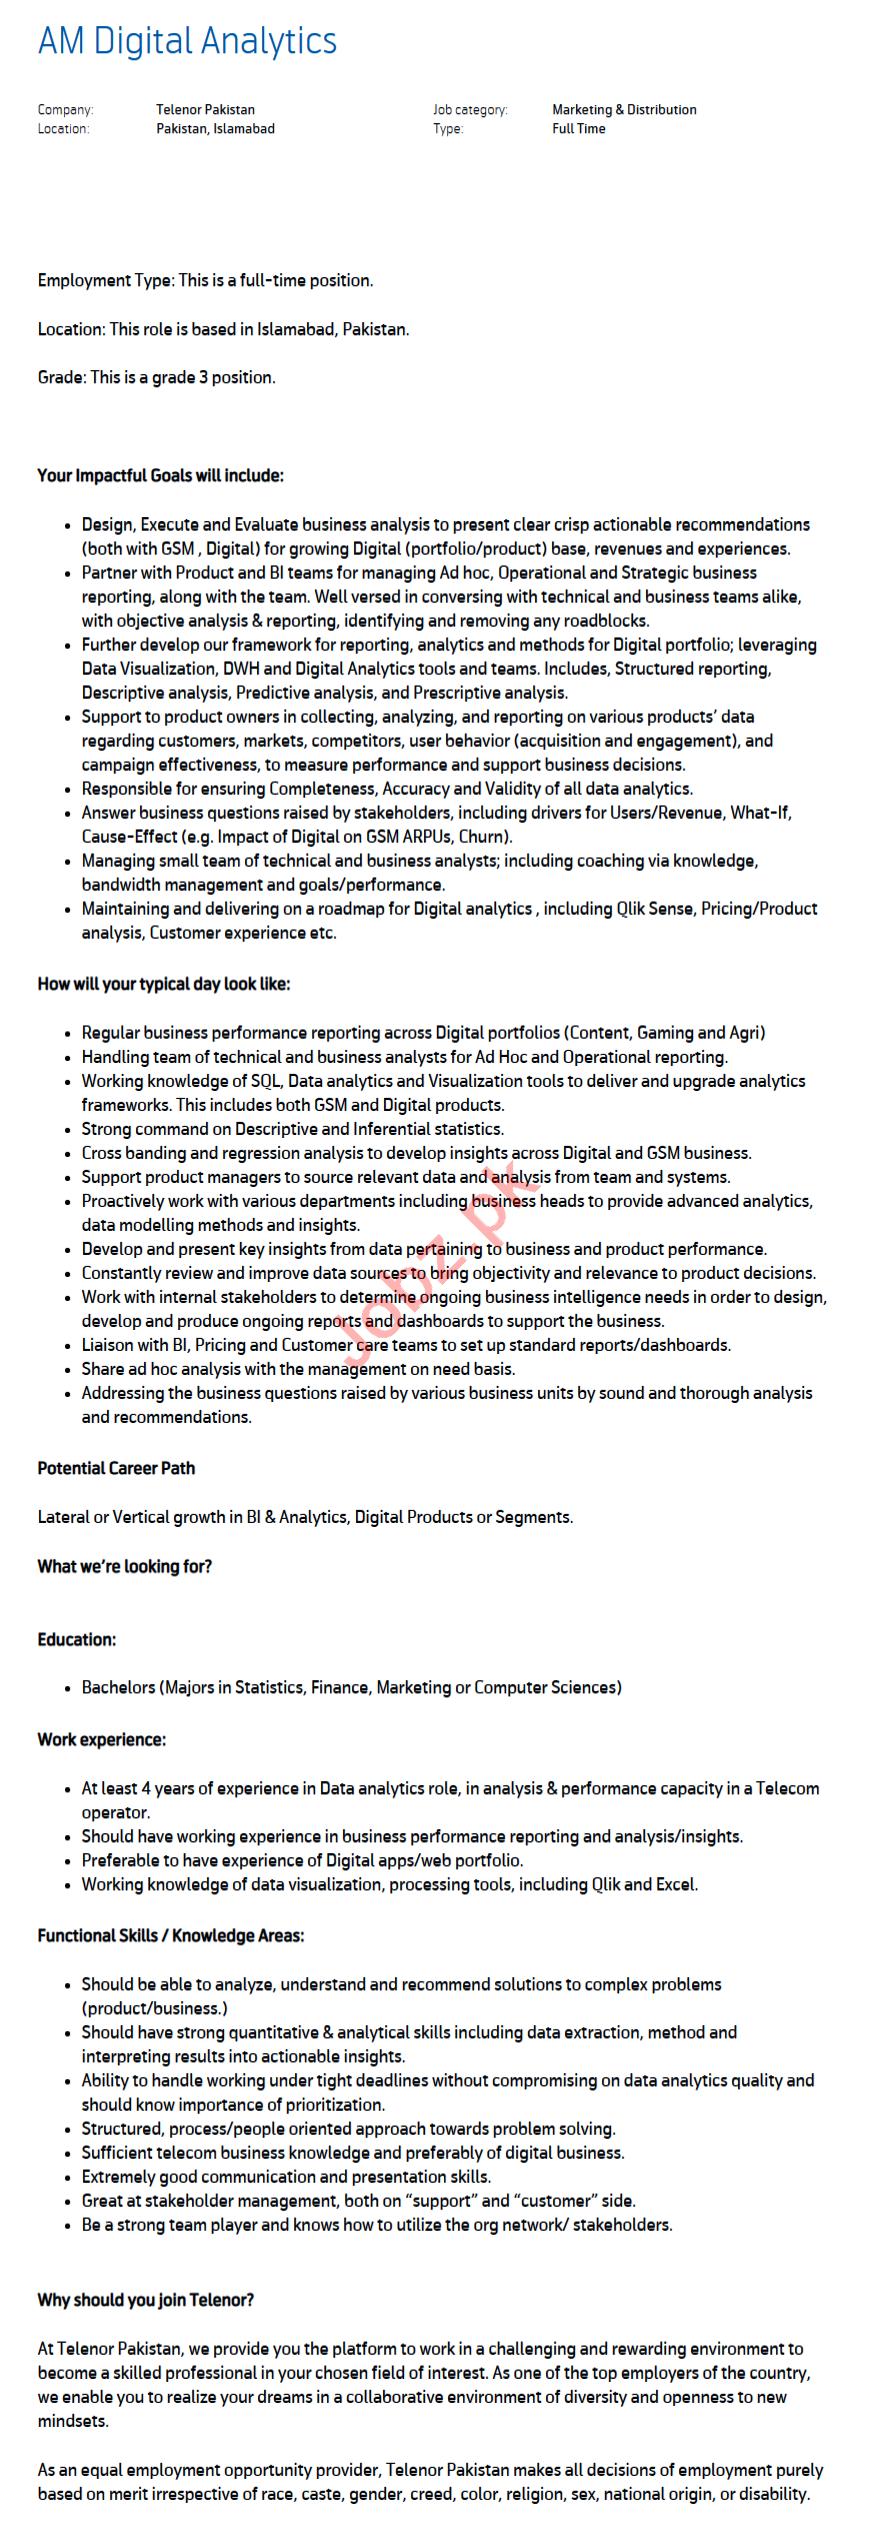 AM Digital Analytics Islamabad Jobs 2021 Telenor Pakistan